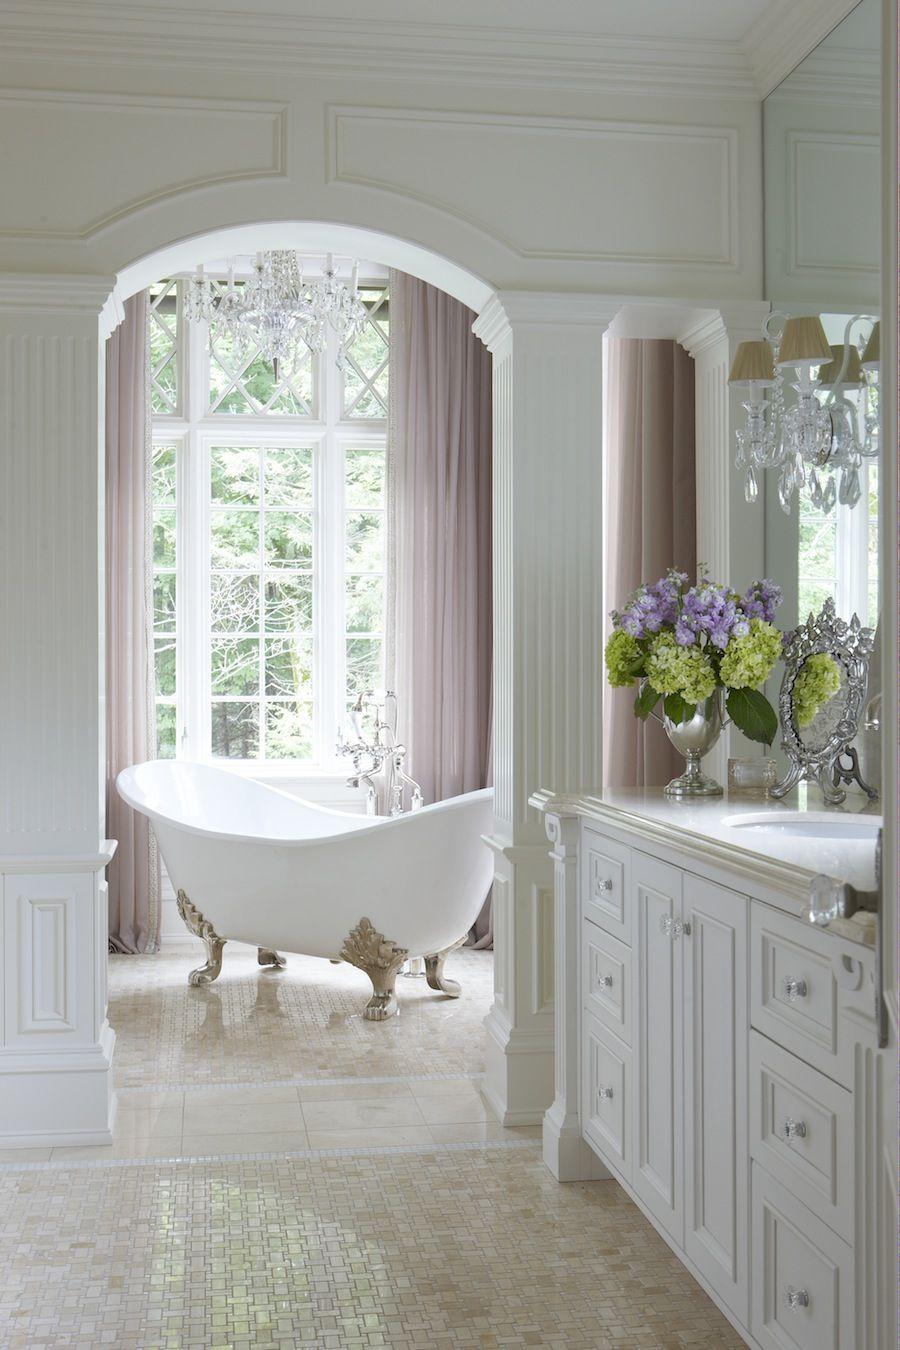 A Fairytale Bath | Beautiful kitchen